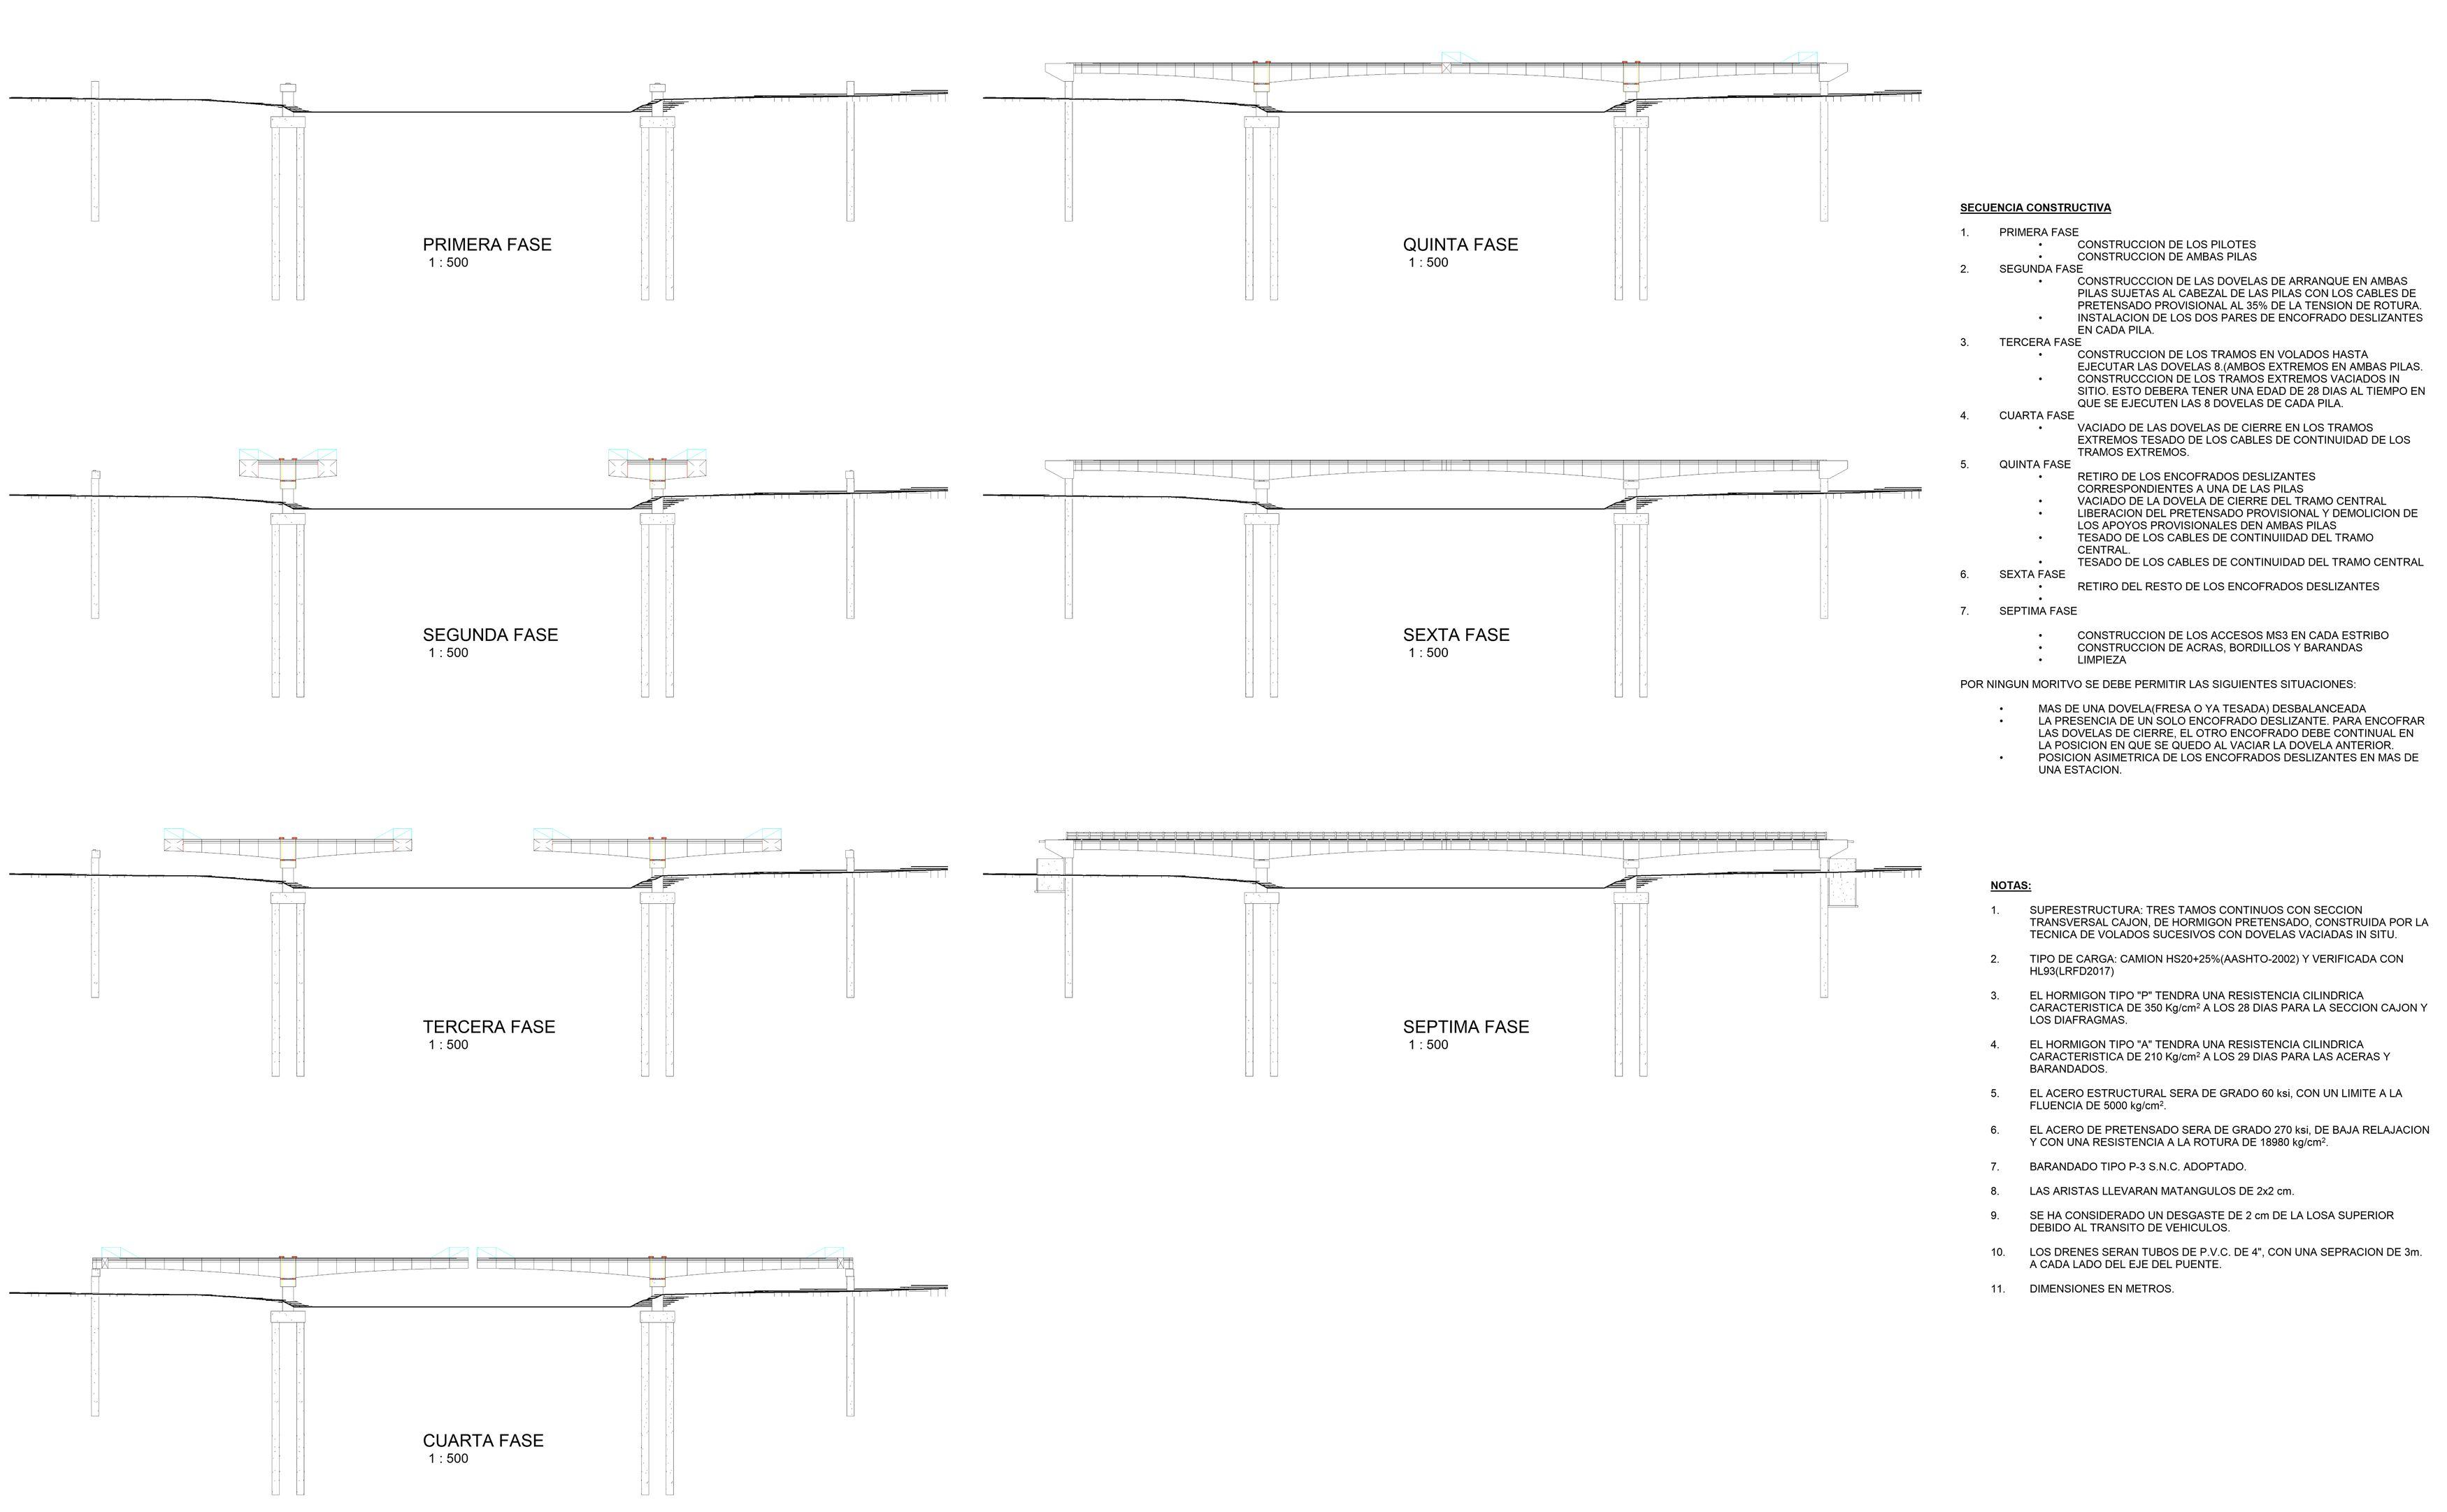 133---modelo-puente-rev30---plano---3---fase-constructiva-3500-3500